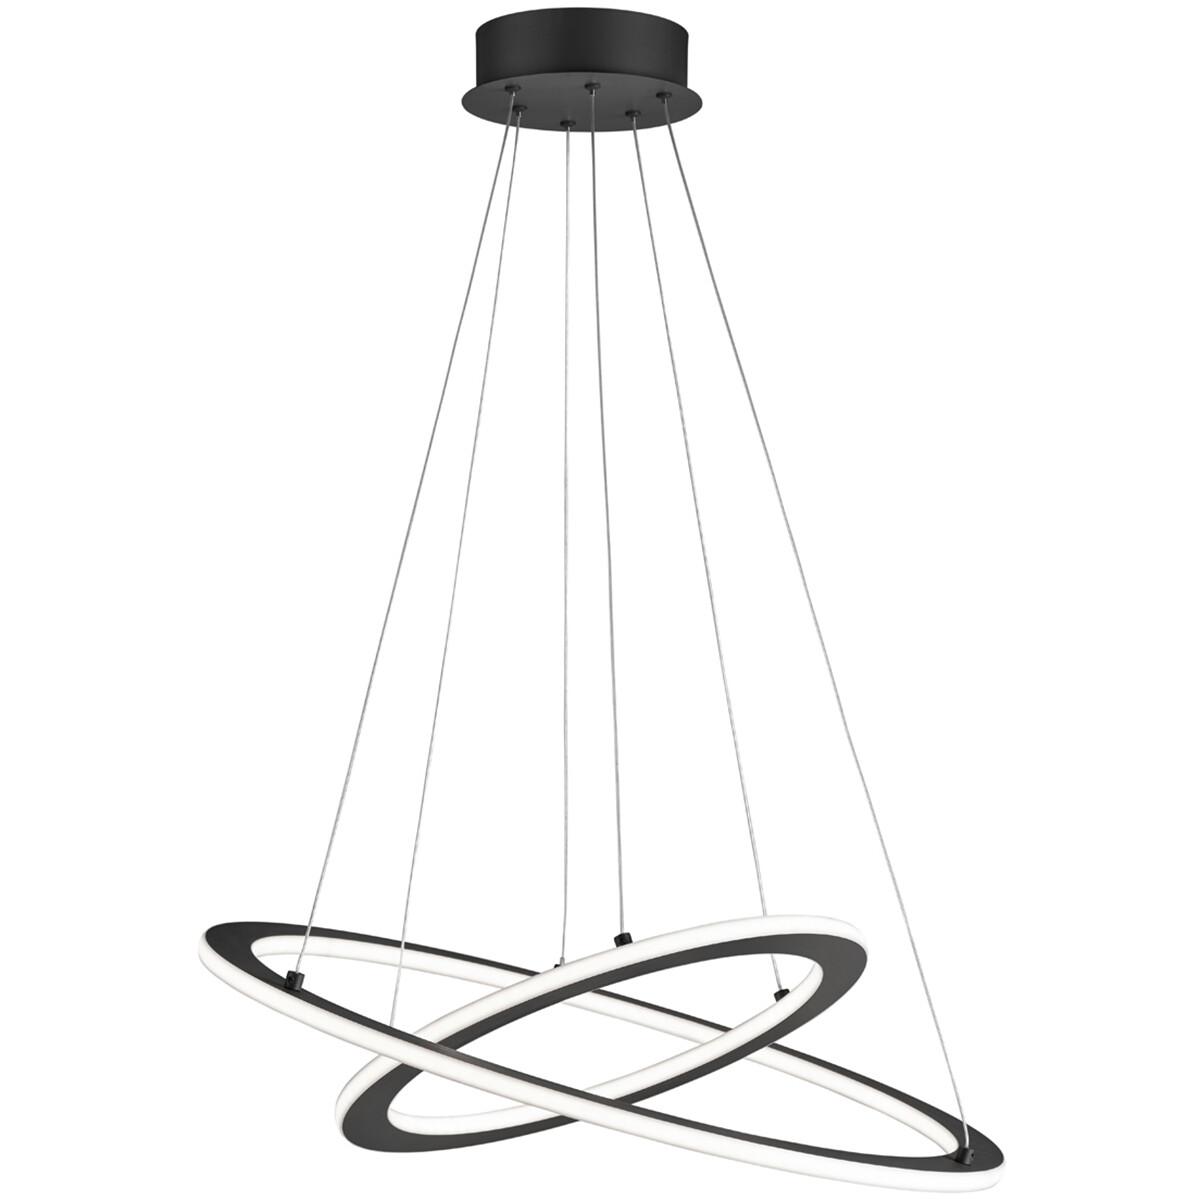 LED Hanglamp - Trion Duban - 40W - Warm Wit 3000K - Dimbaar - Rond - Mat Zwart - Aluminium